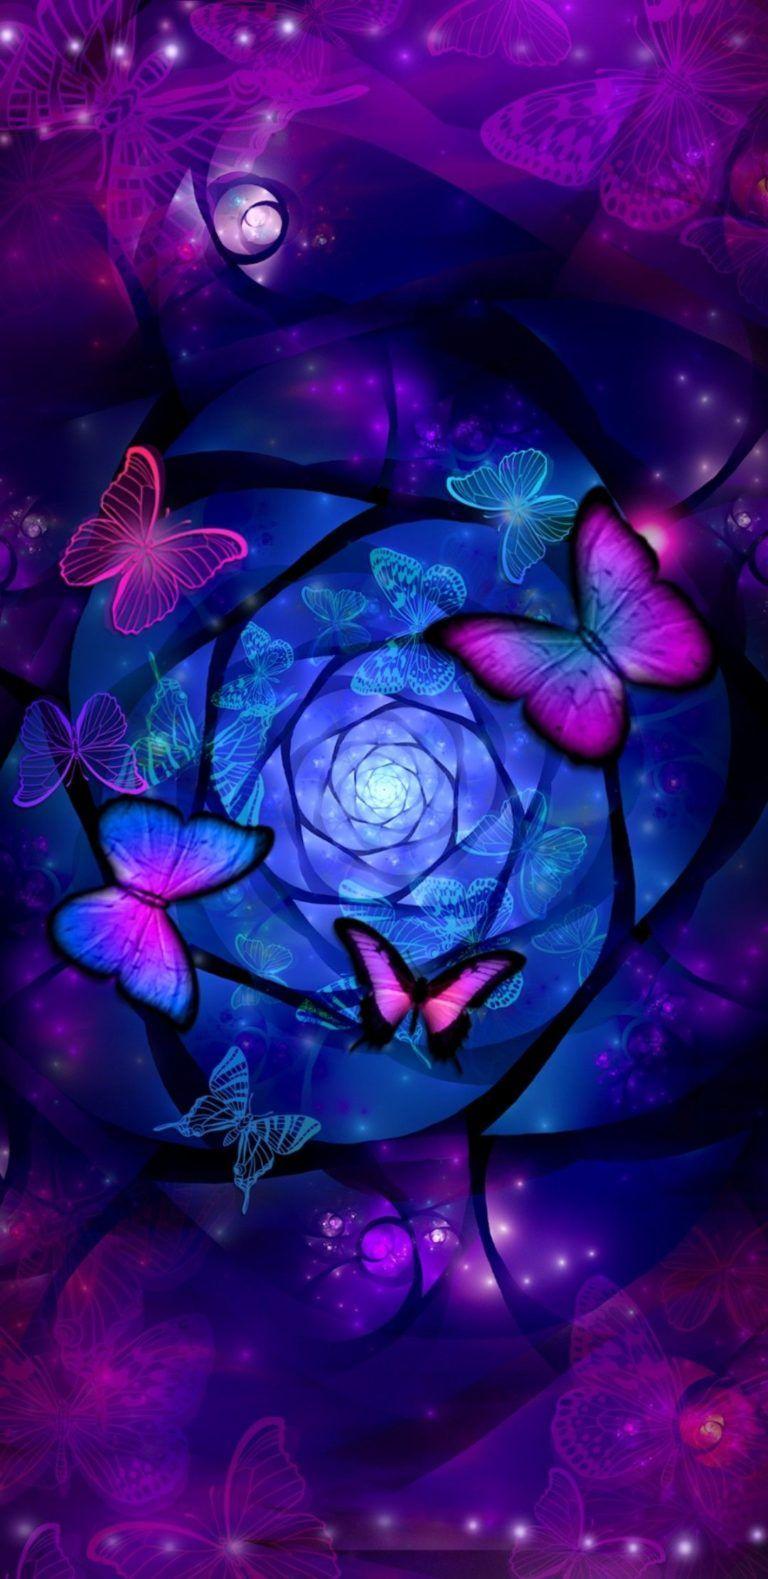 iPhone Wallpaper | Purple, Blue, Violet, Fractal art ...